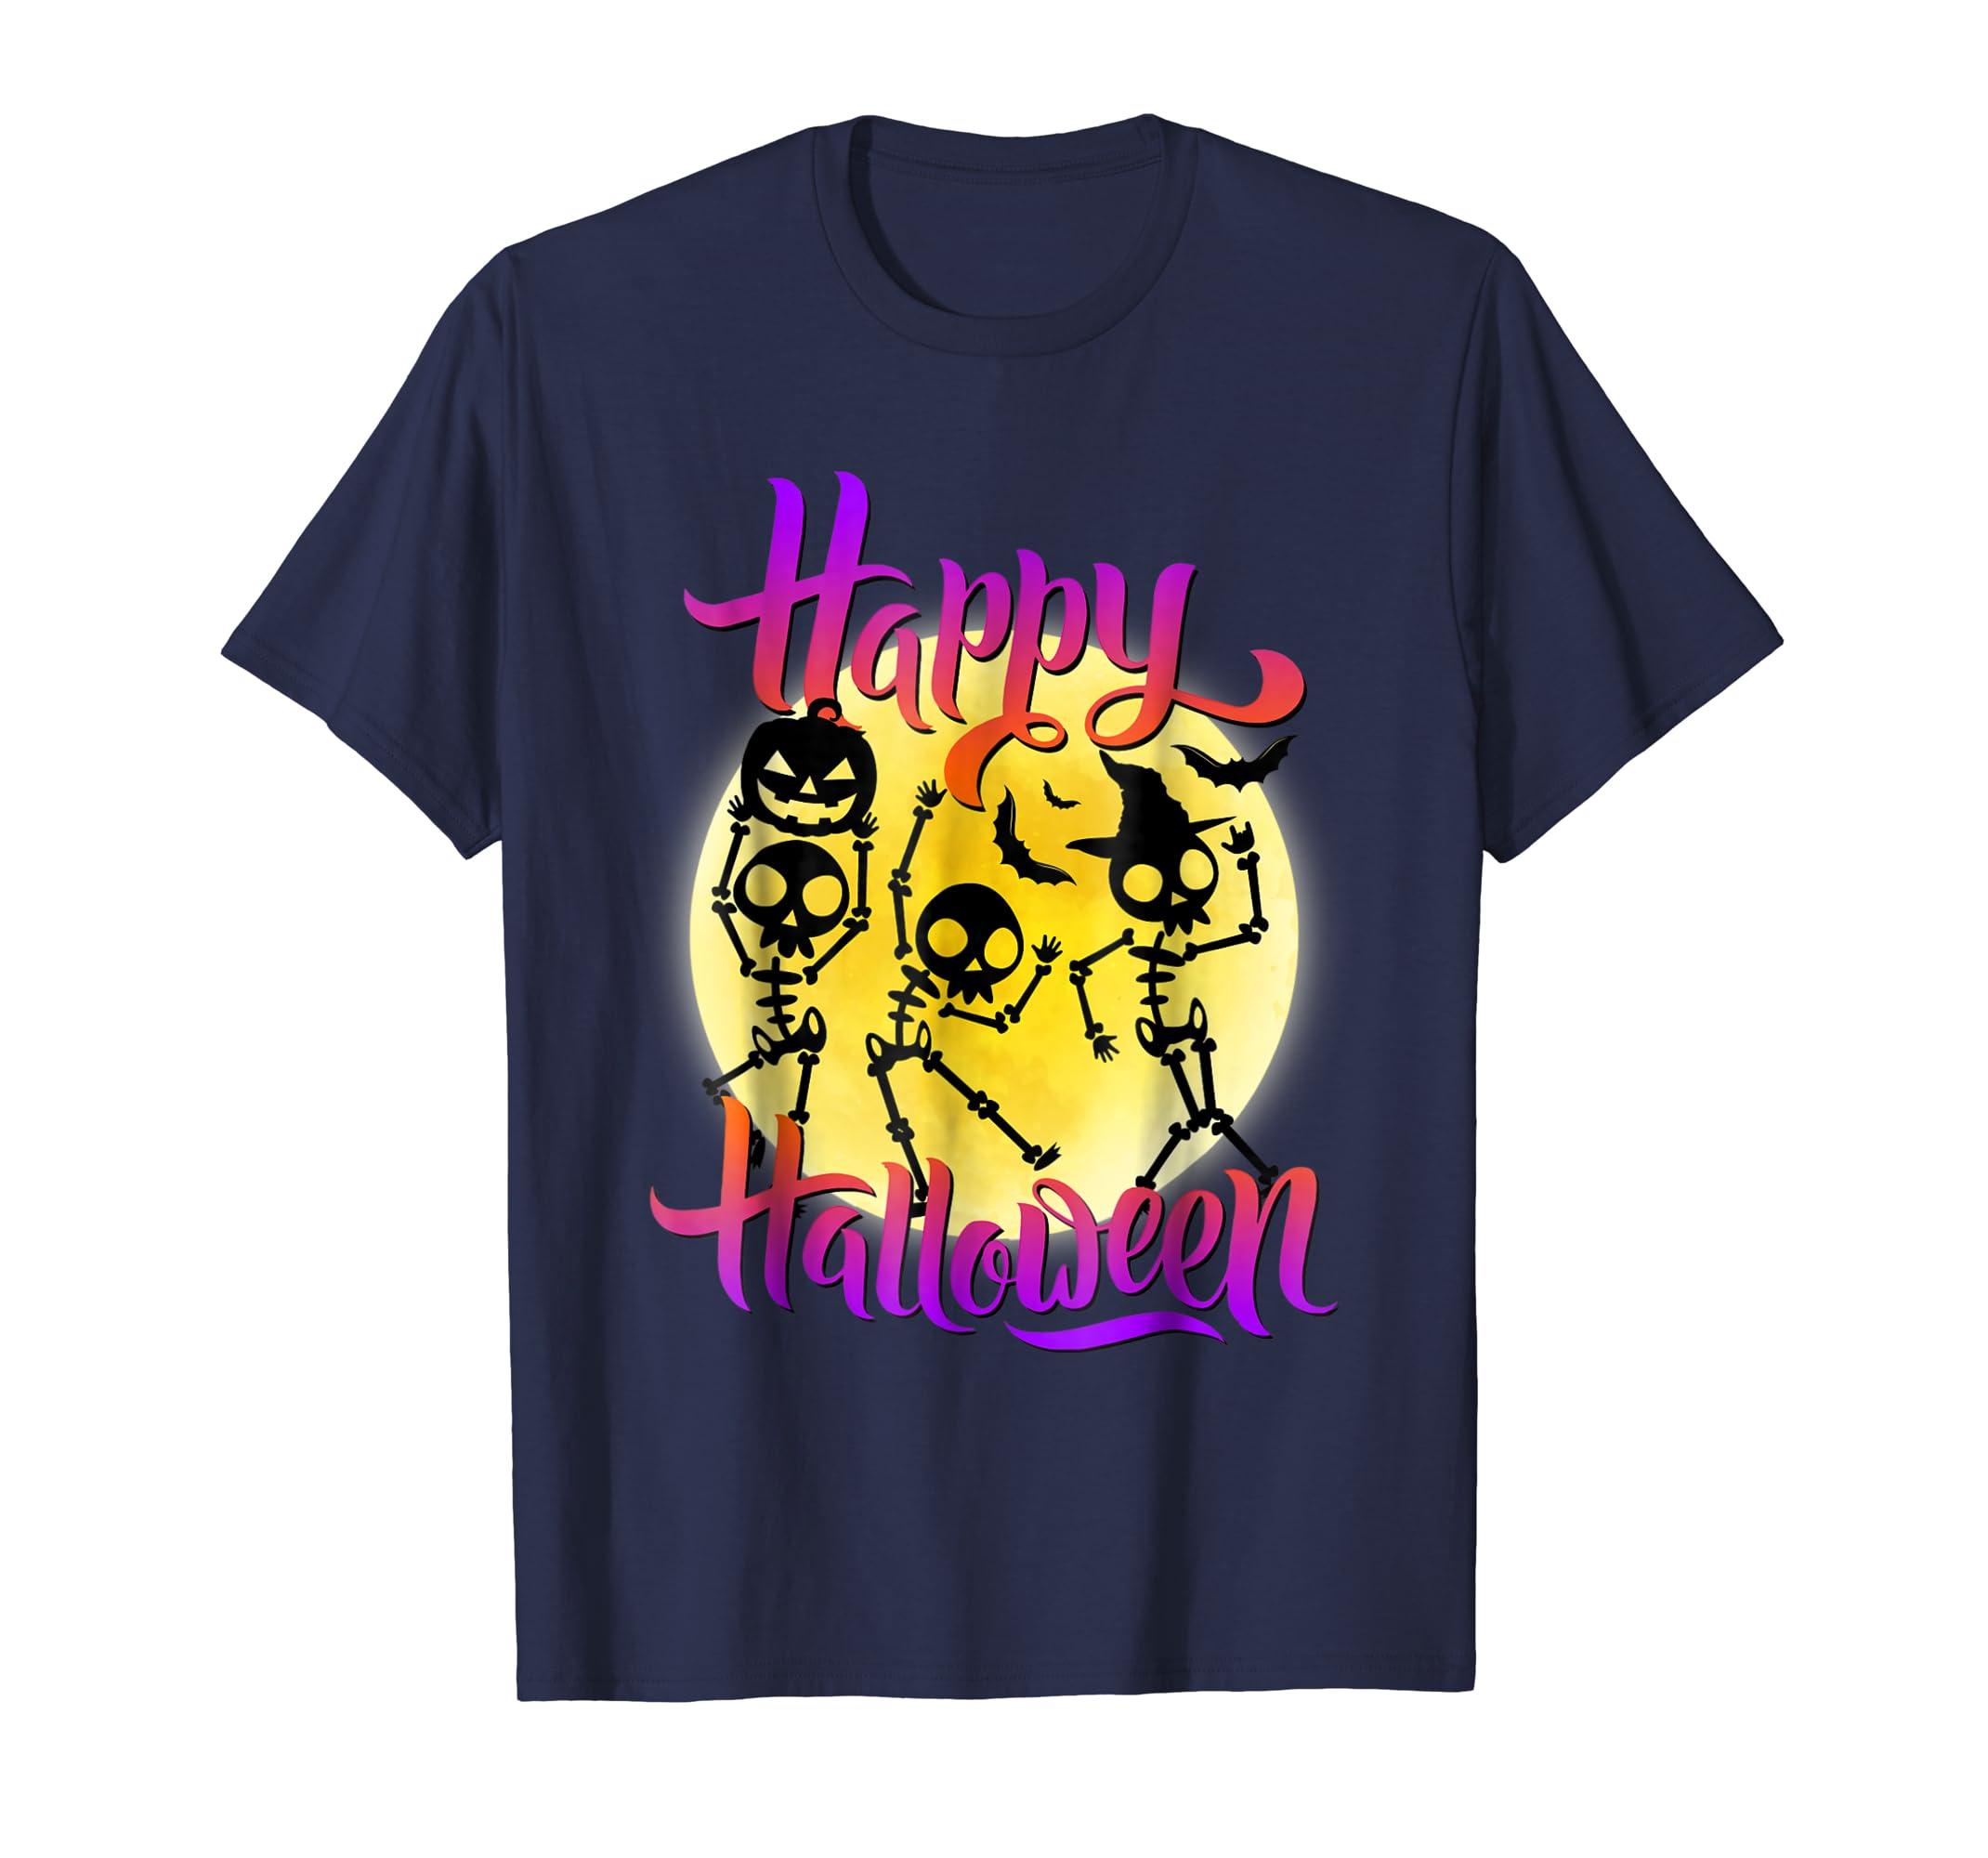 Dancing Skeleton Dance Party Halloween Party T-Shirt-ln